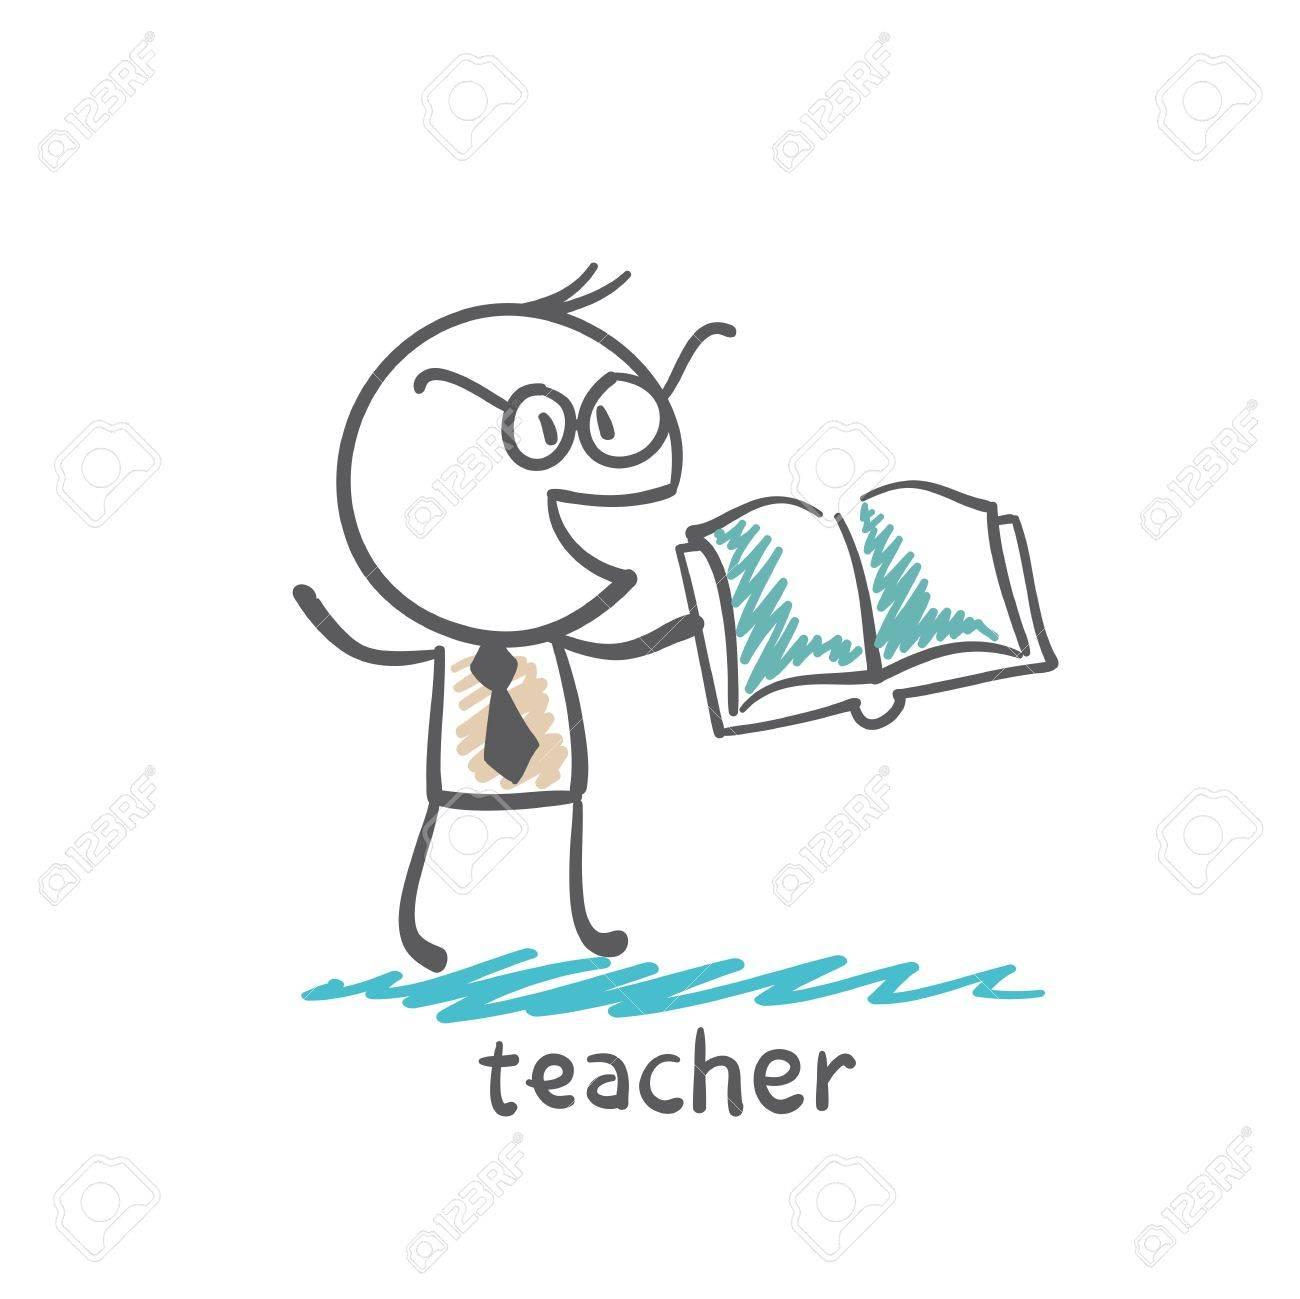 teacher with book illustration - 36068995